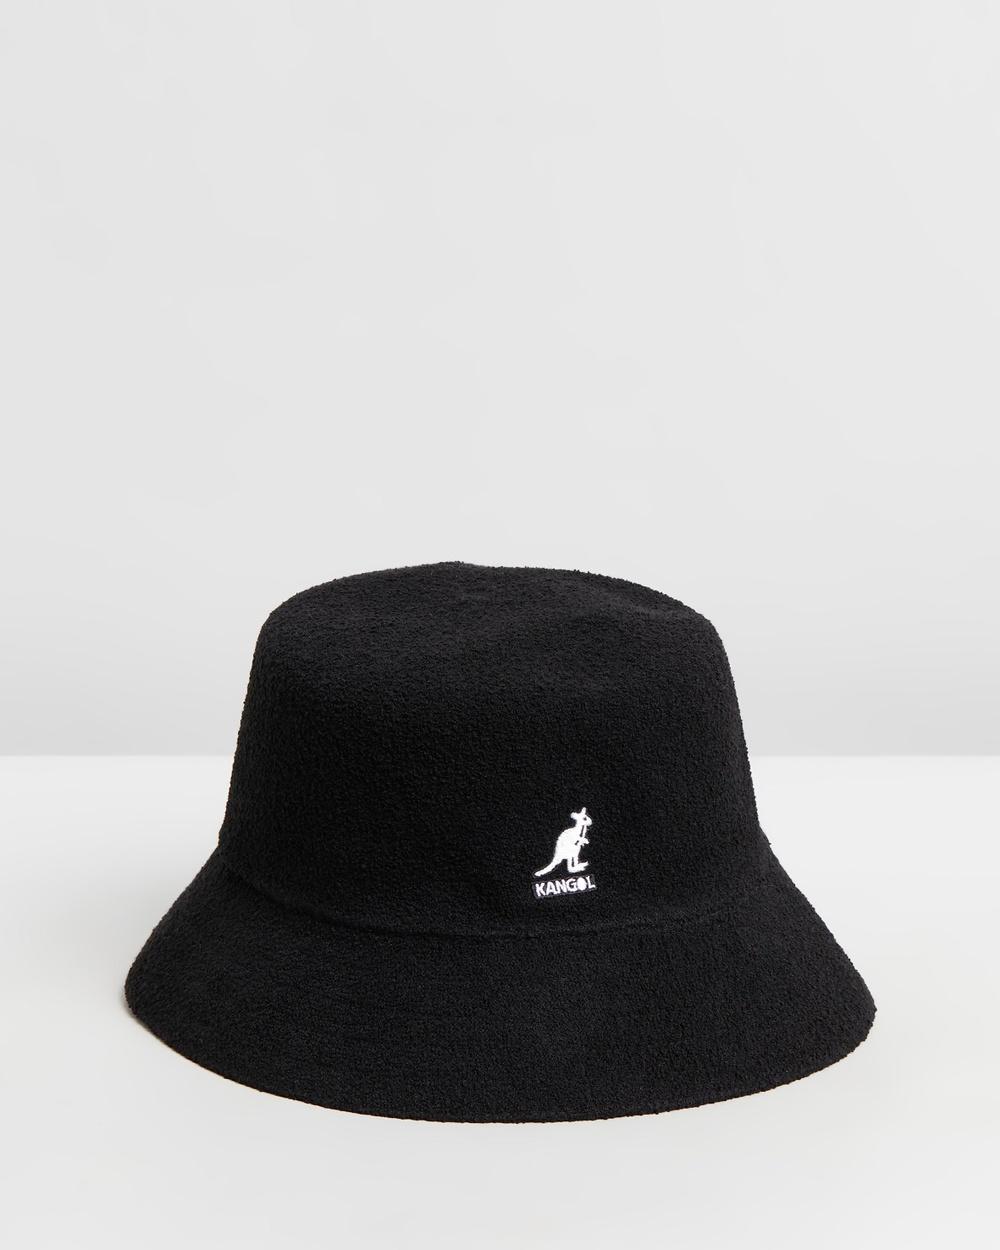 Kangol Bermuda Bucket Hat Hats Black